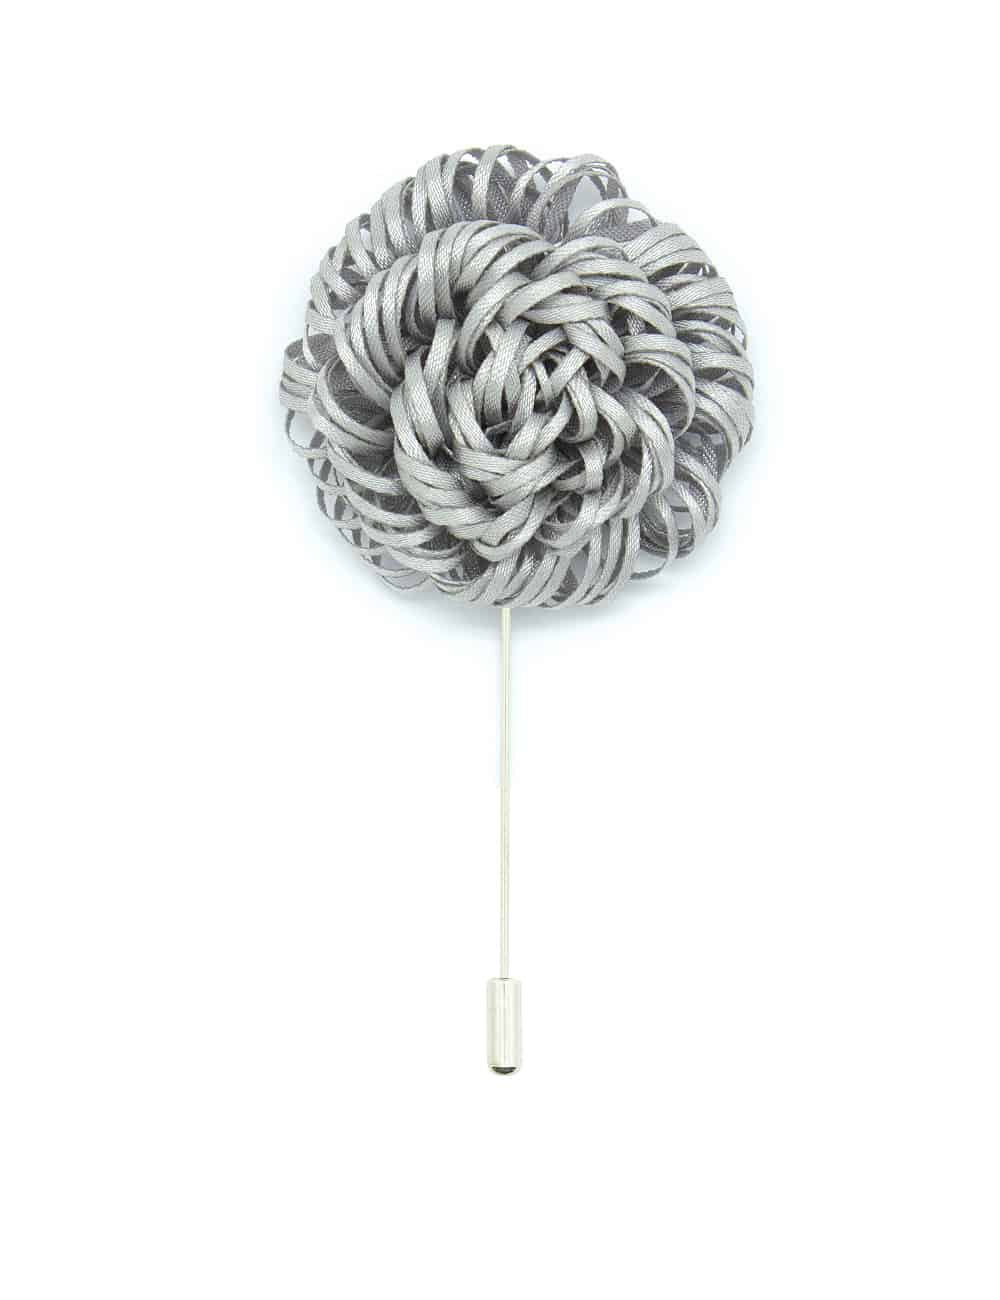 Light Grey Twirl Floral Lapel Pin LP52.10